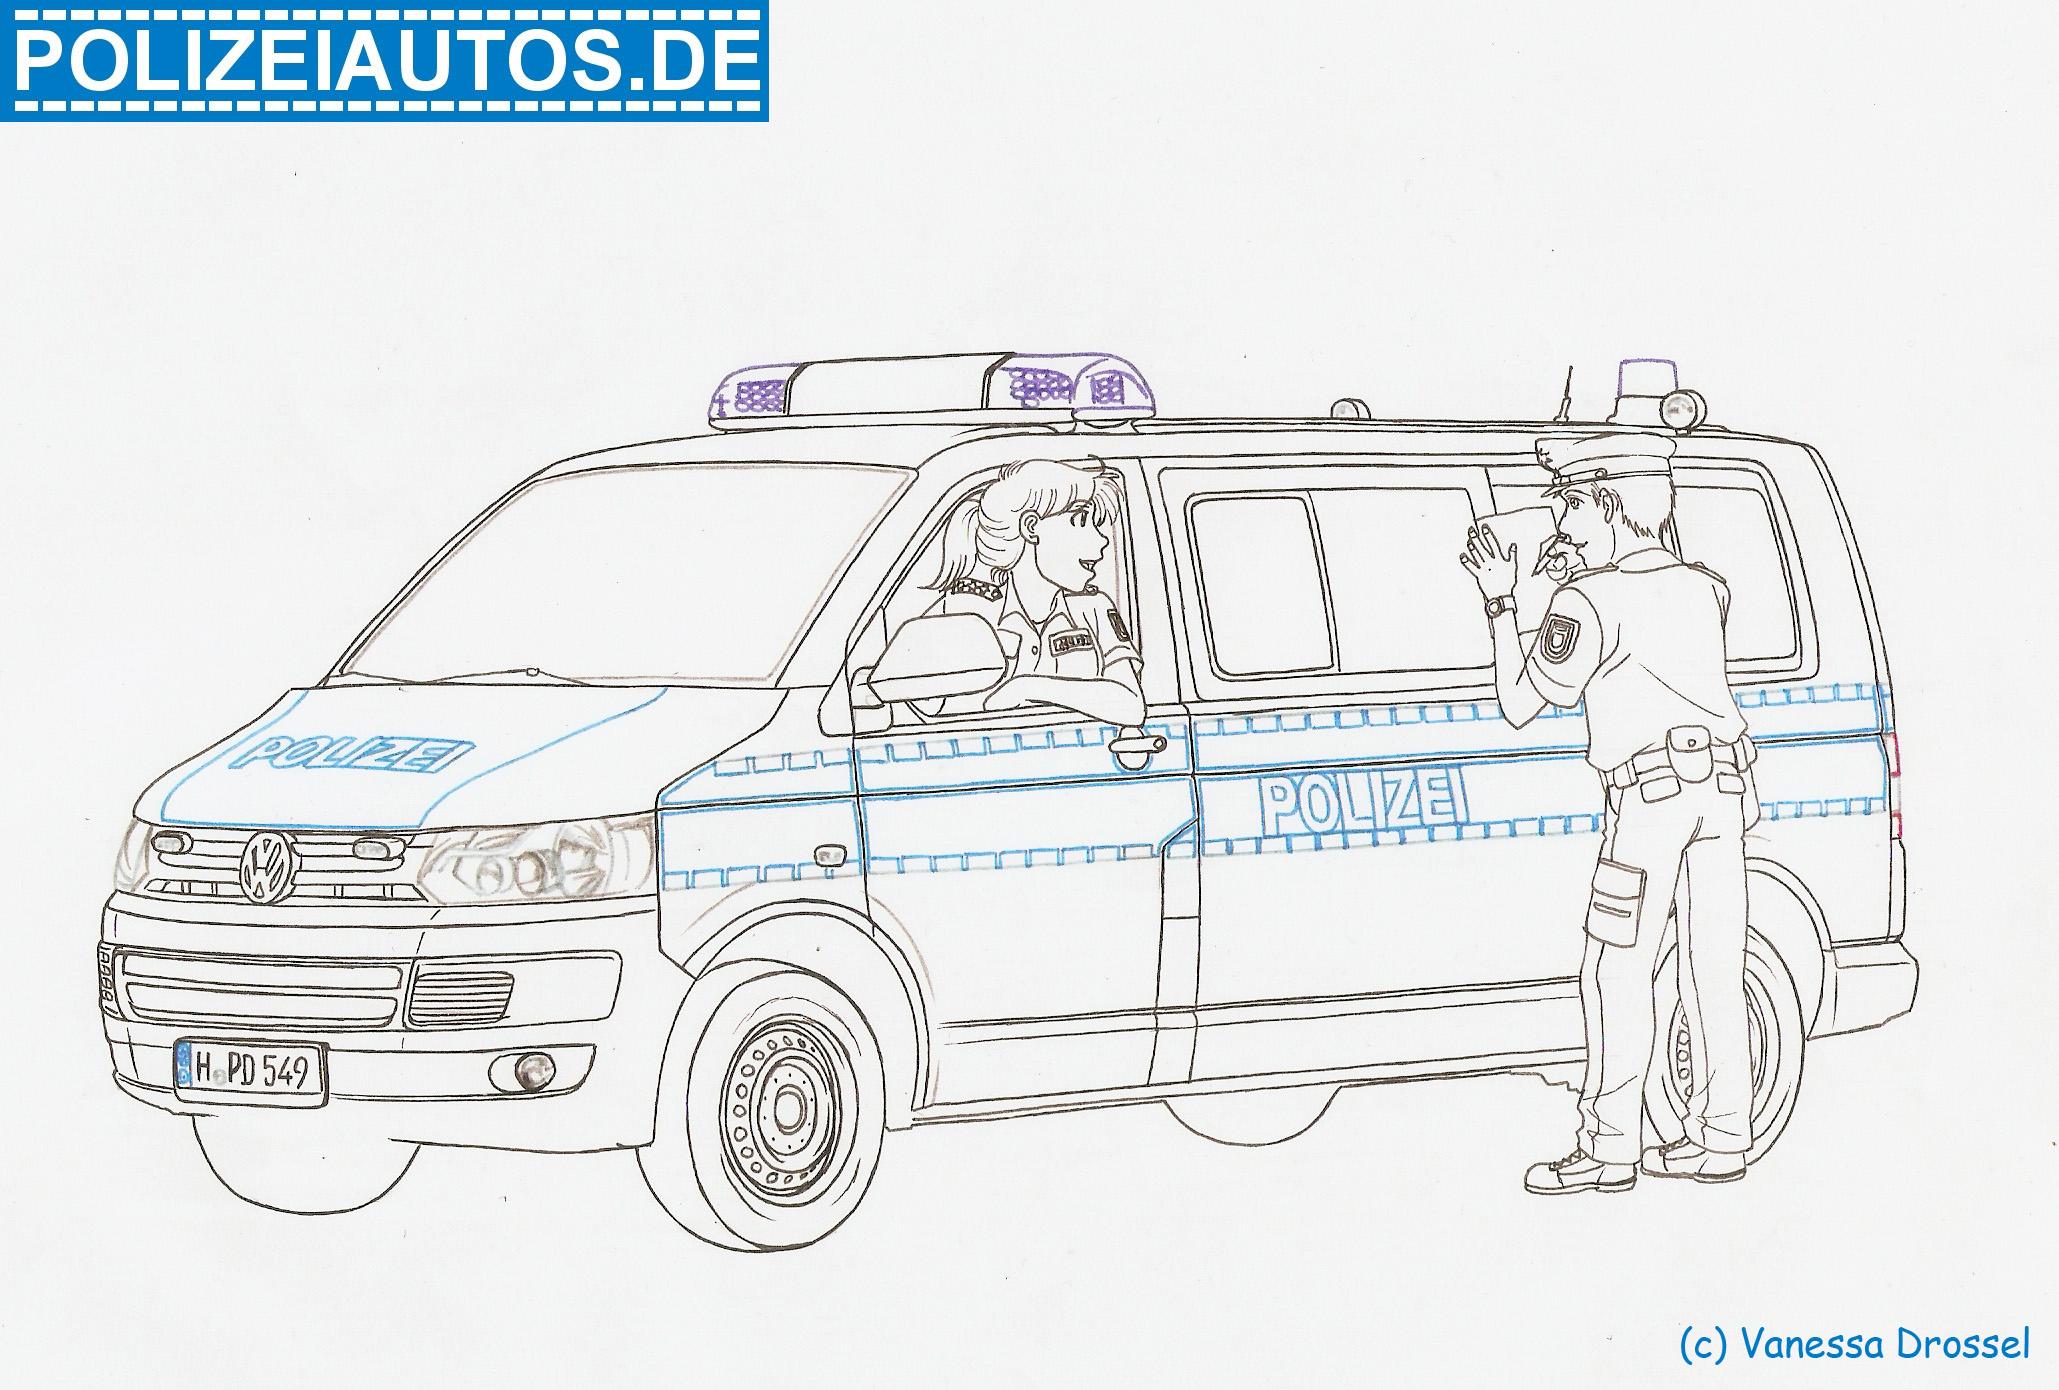 wellcome to image archive ausmalbilder polizei